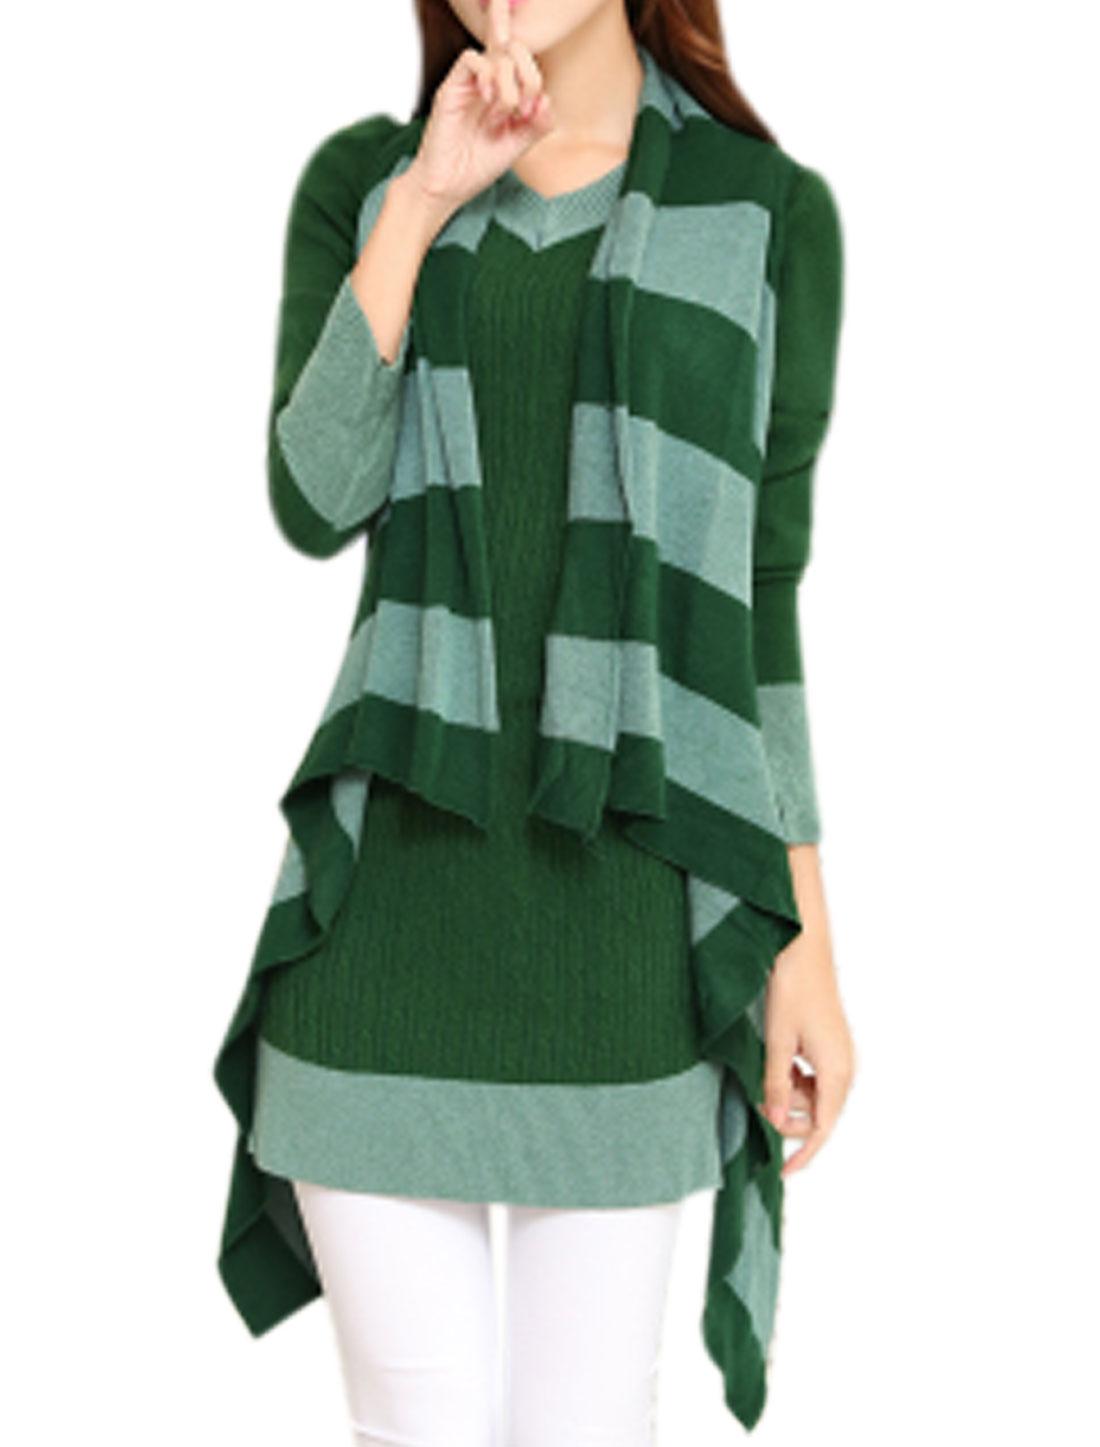 Lady Cardigan Irregular Hem Casual Knitting Vest Dusty Green XS